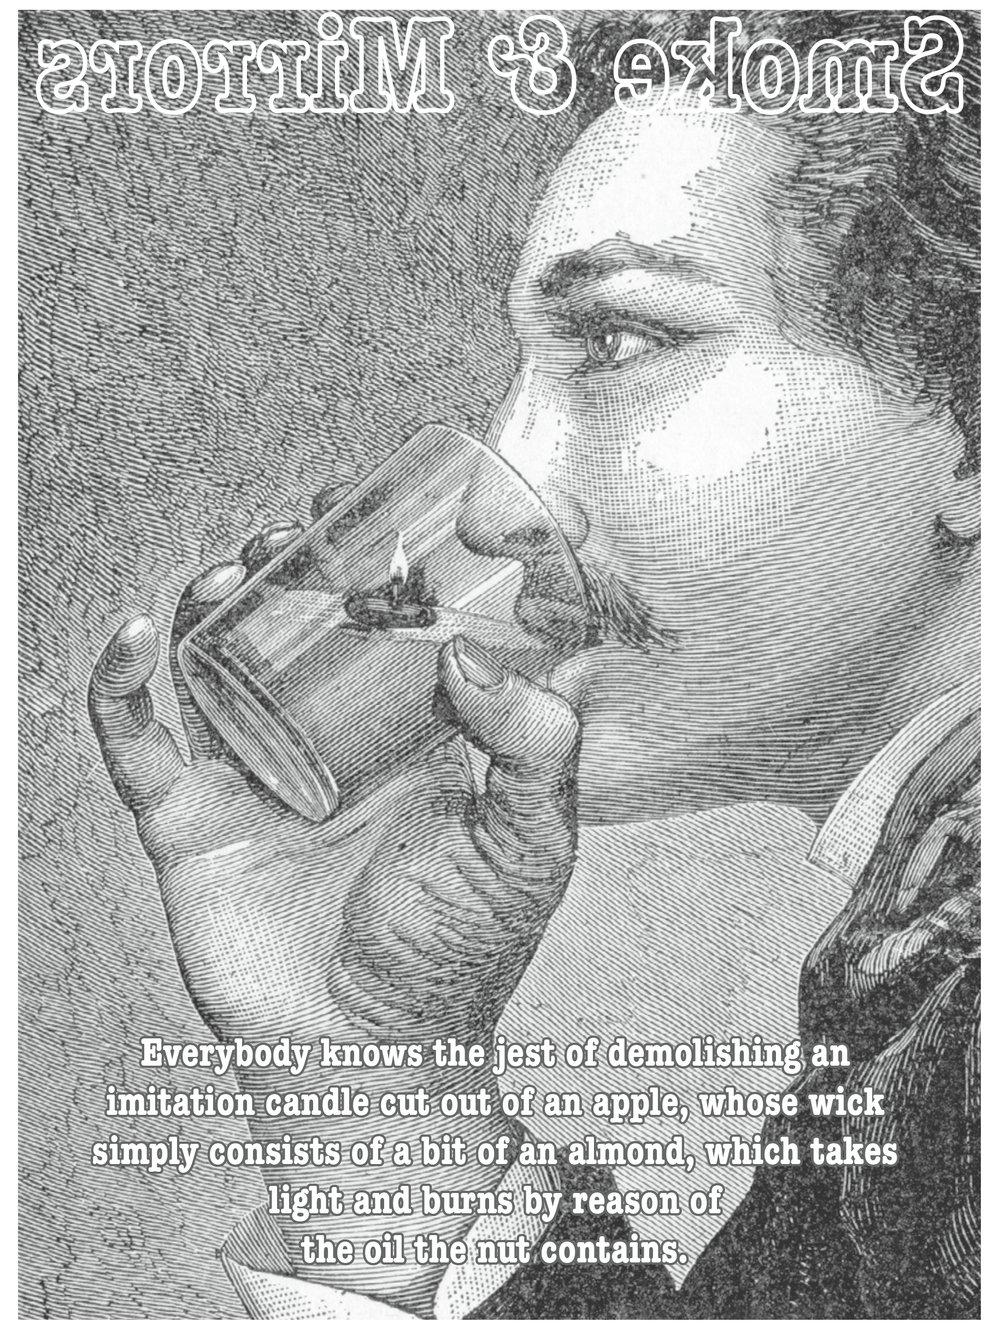 Smoke and Mirrors postcard design1.jpg